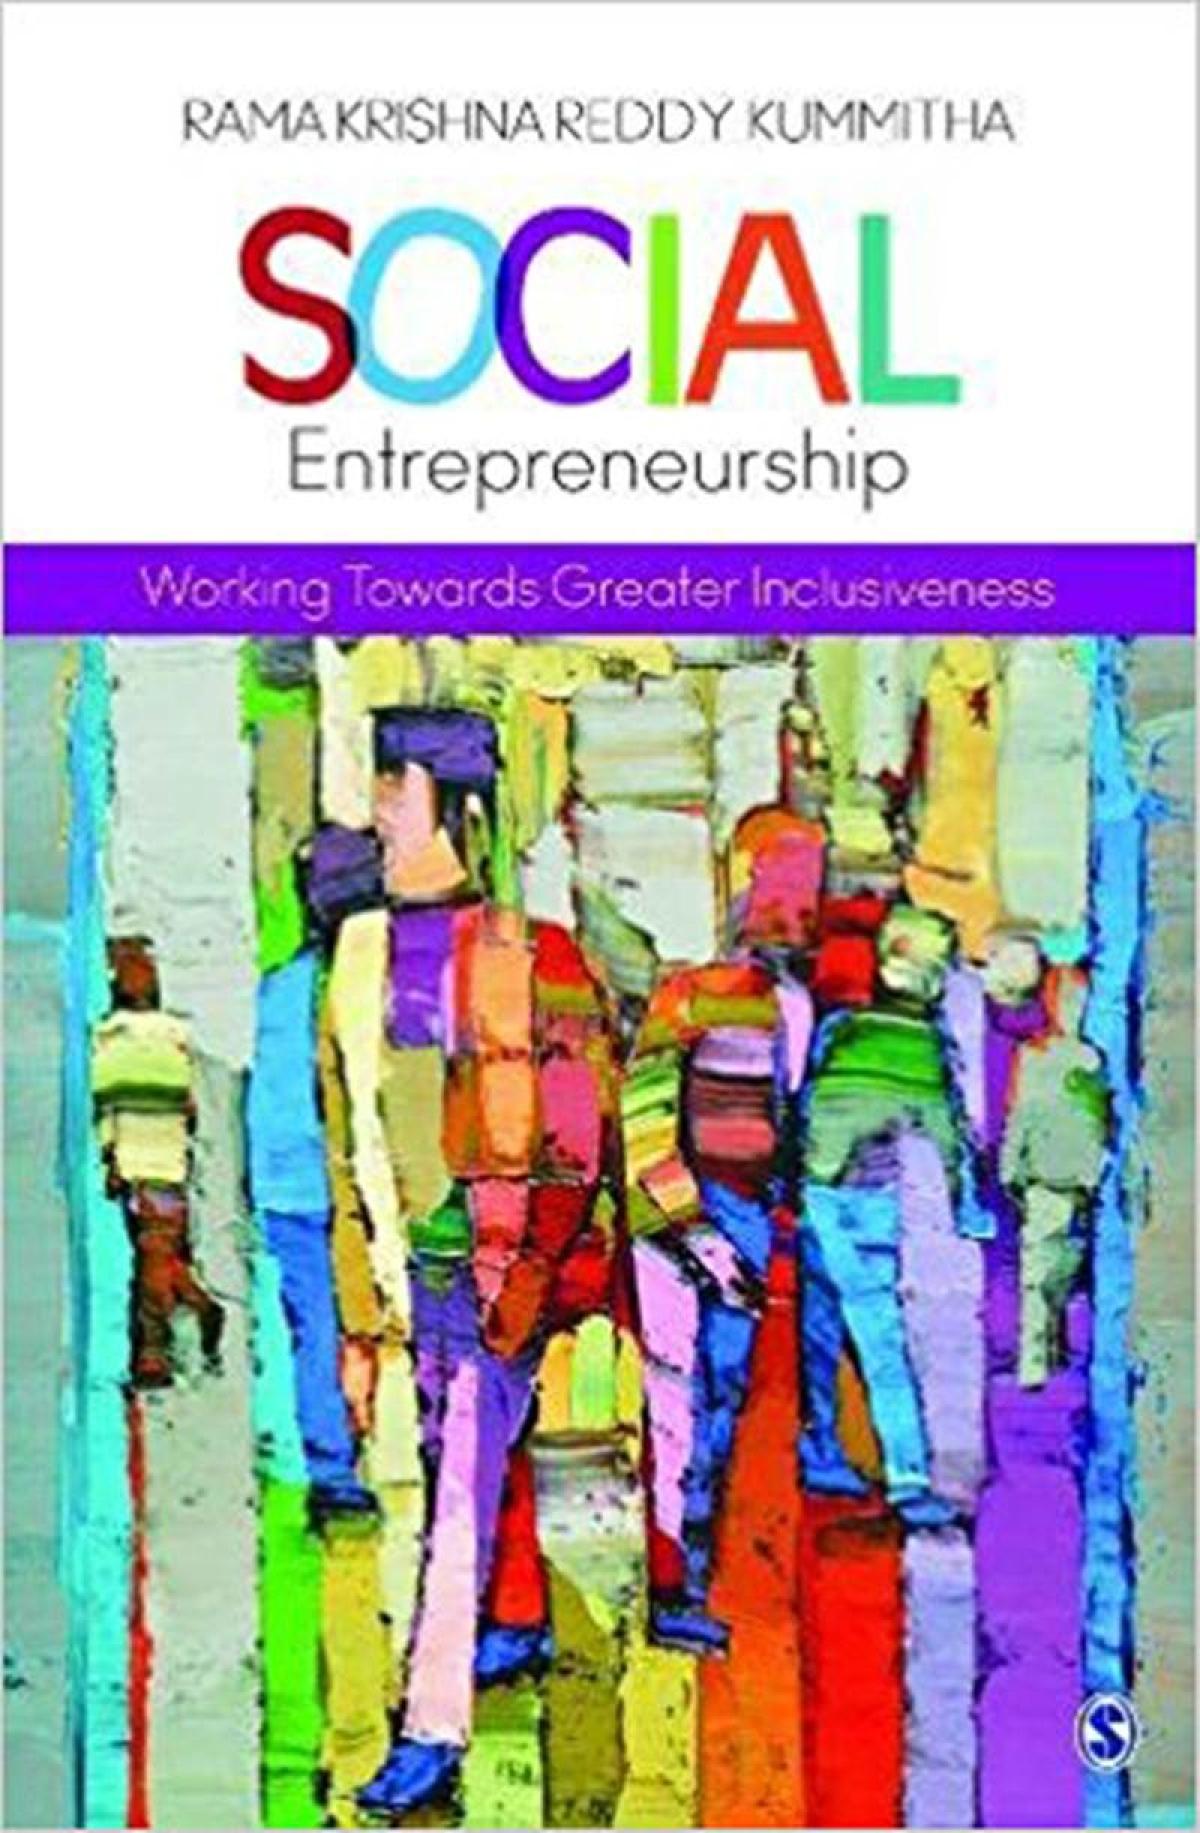 Social Entrepreneurship: Working Towards Greater Inclusiveness- Review